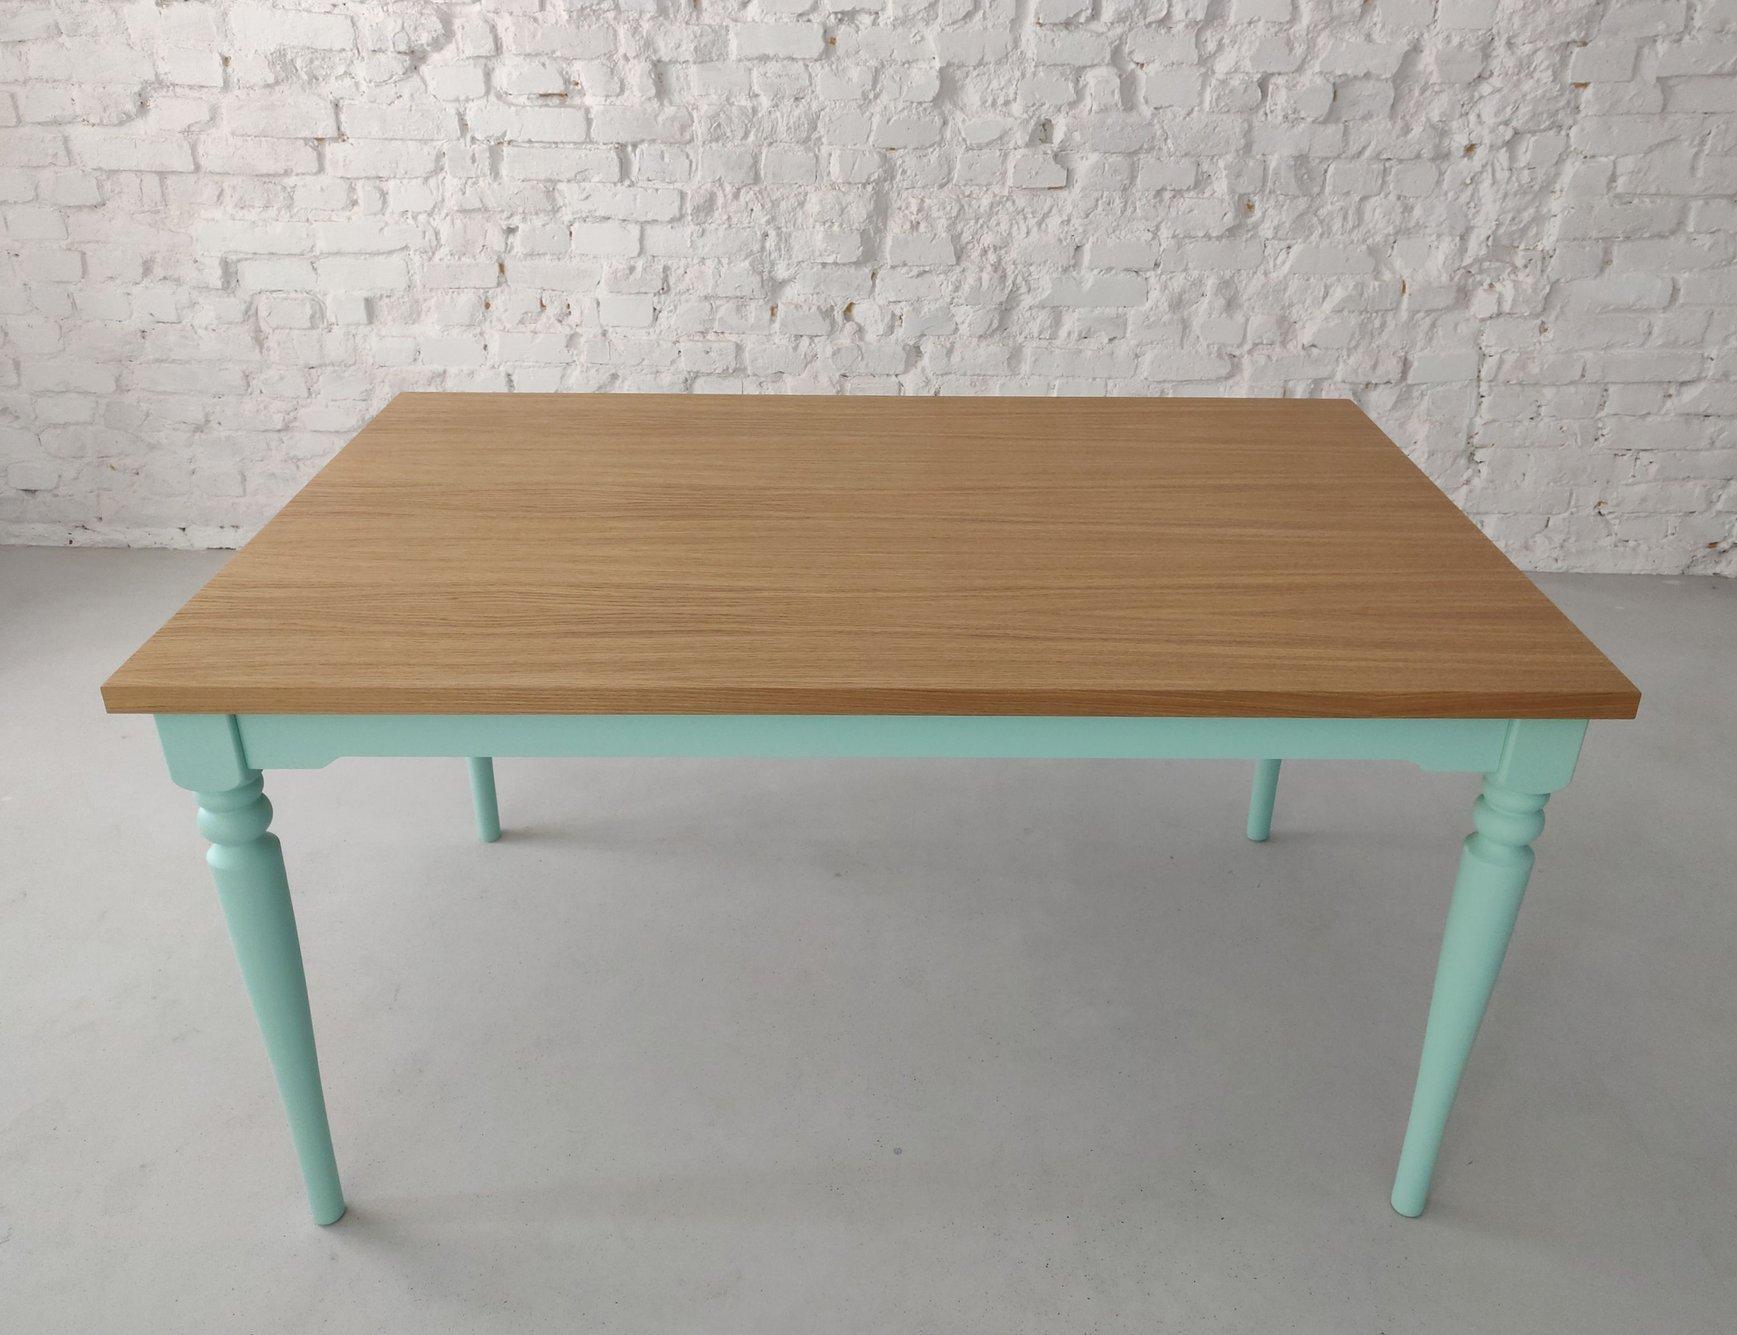 nata oak dining table 140x90cm mint base